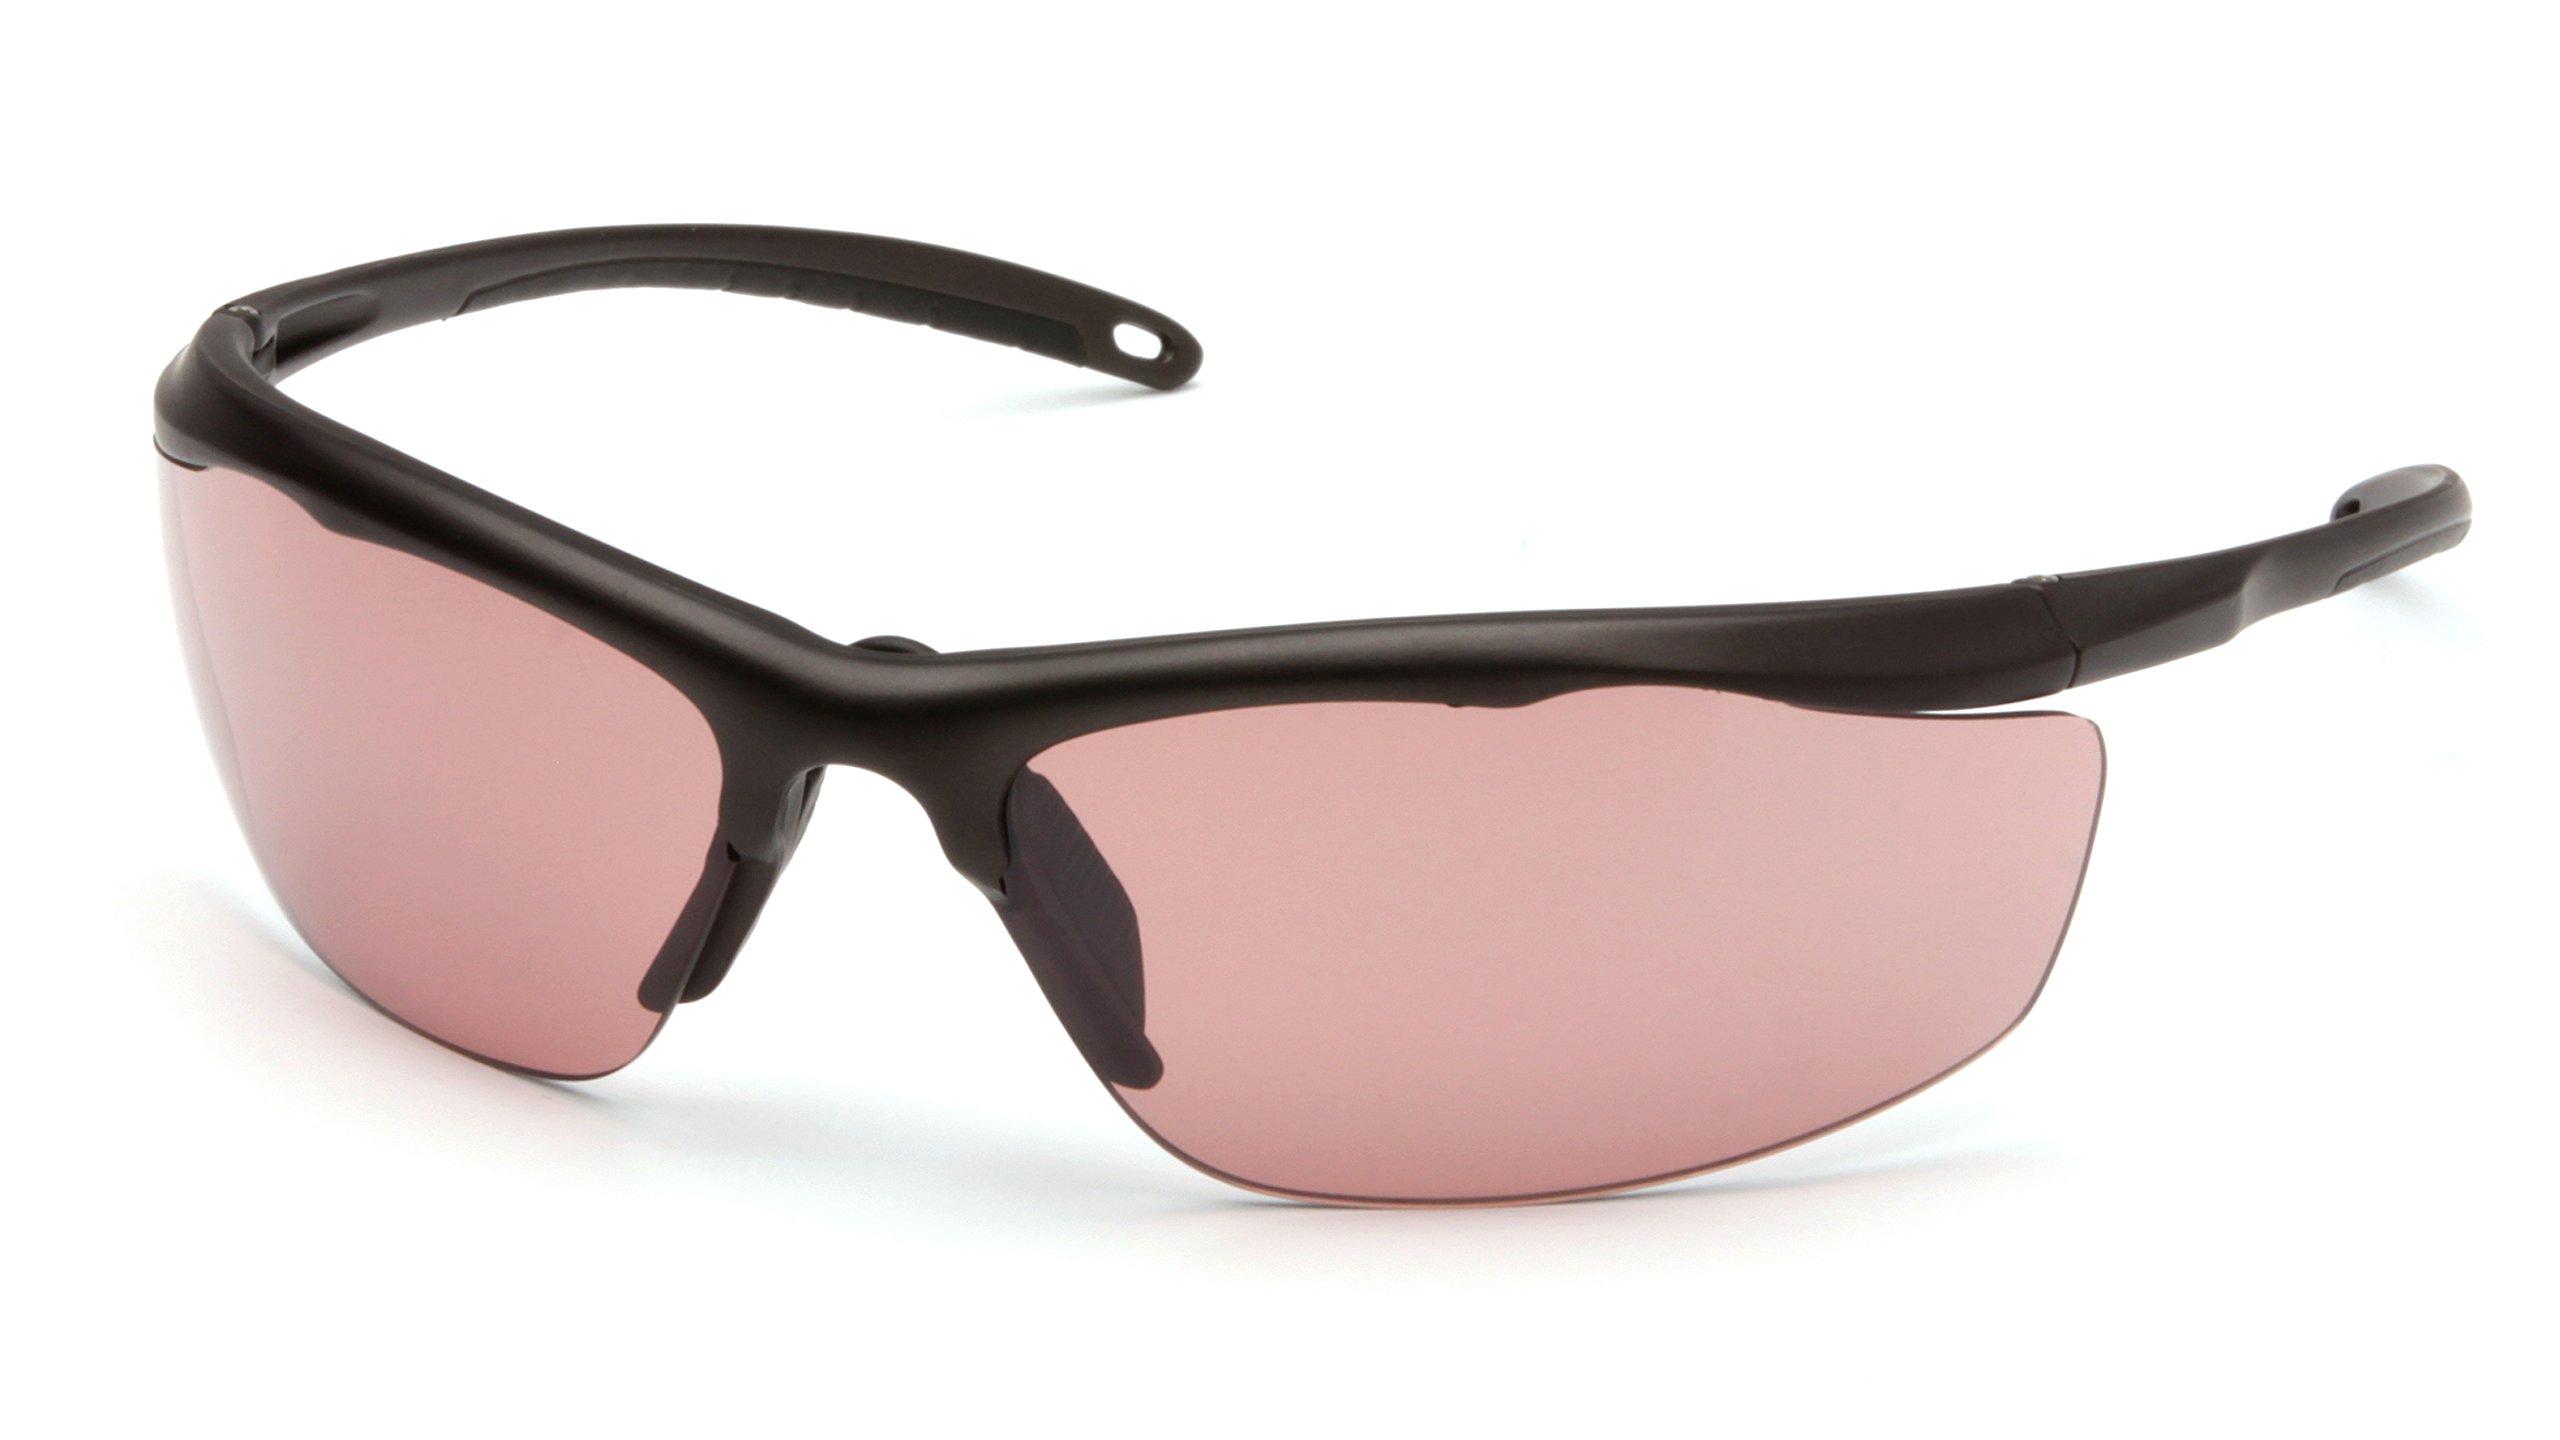 Venture Gear Zumbro Lightweight Sports Style Eyewear, Bronze Frame, Smoke Vermilion Anti-Fog Lens